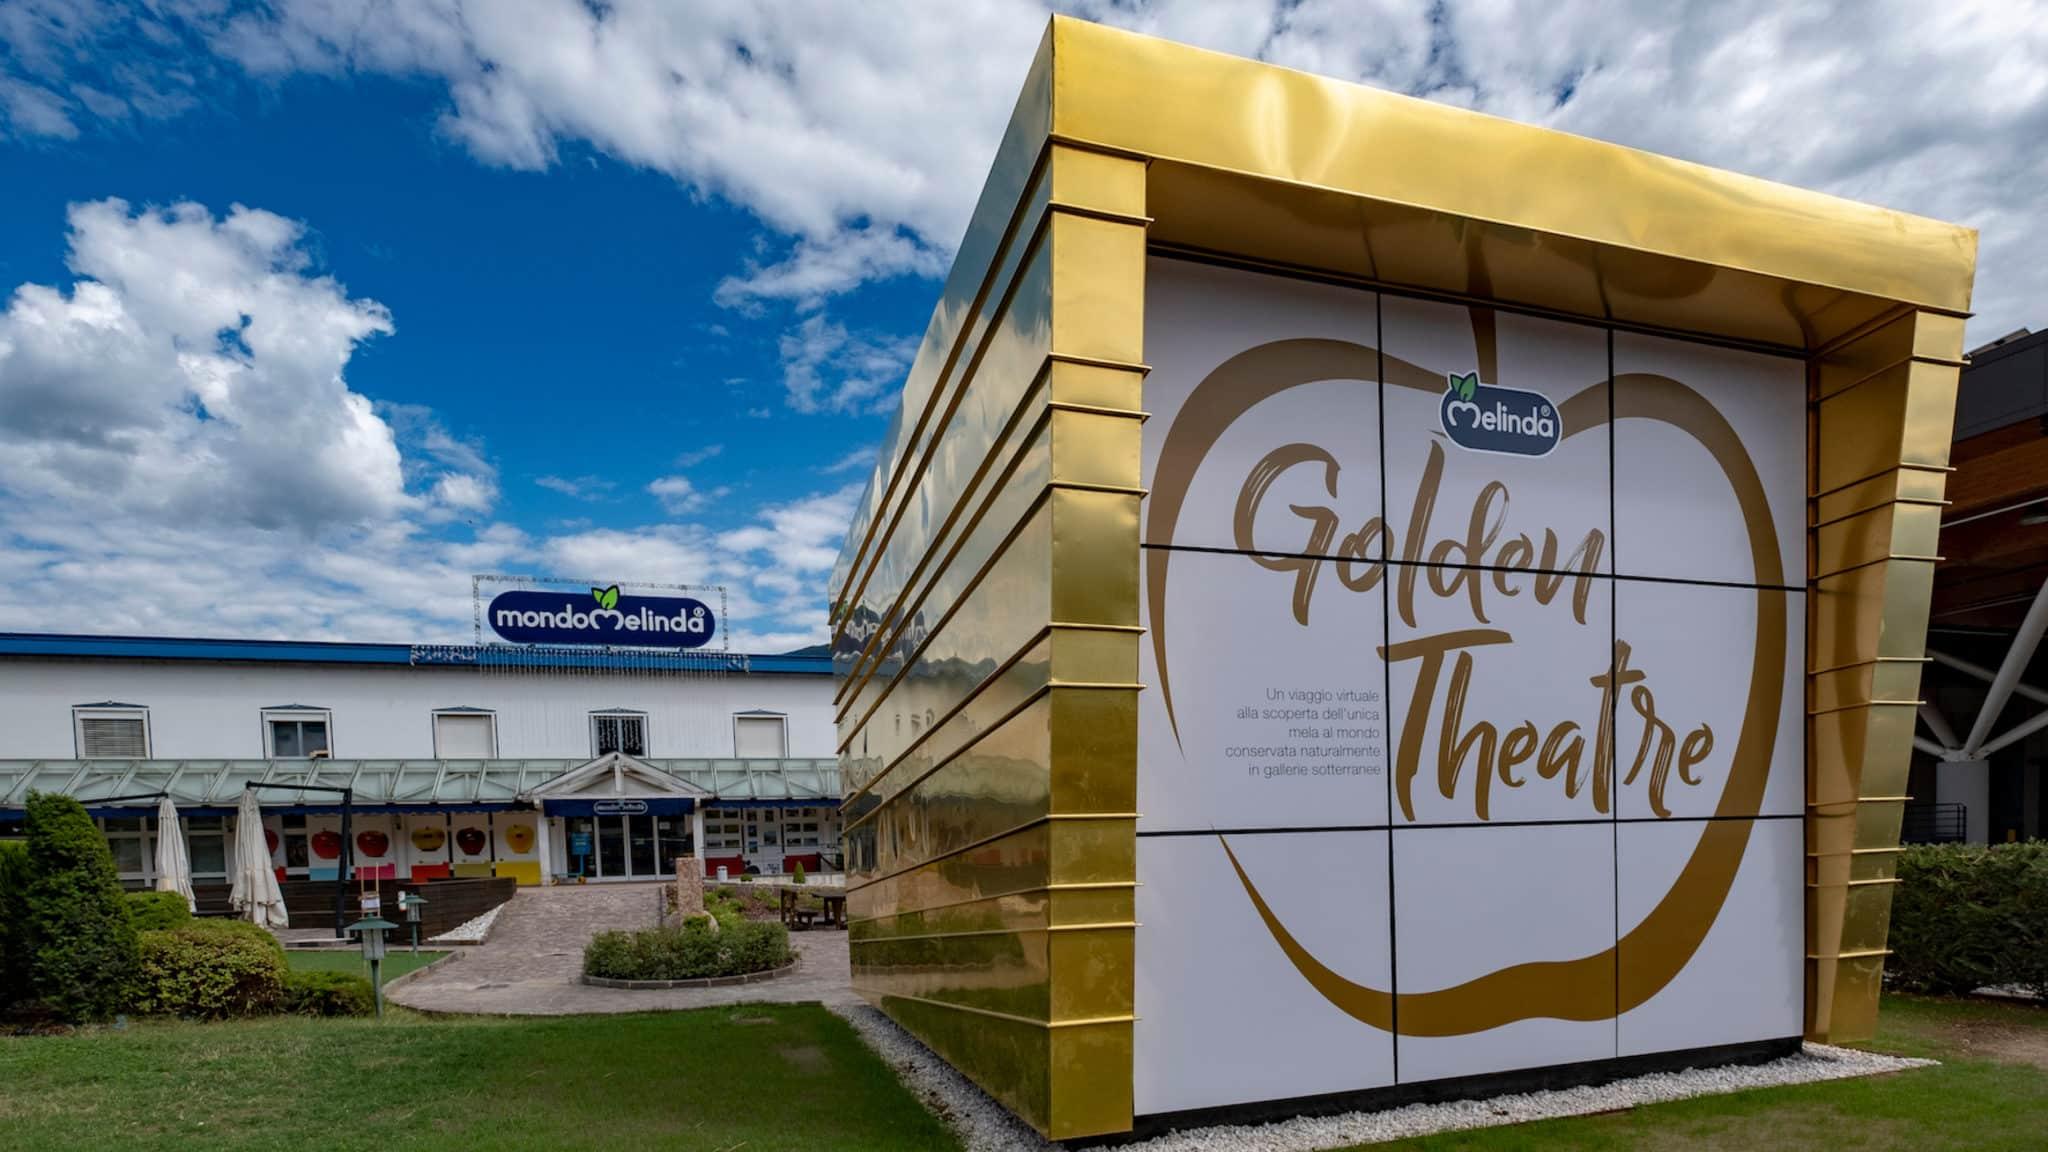 Melinda Golden Theatre